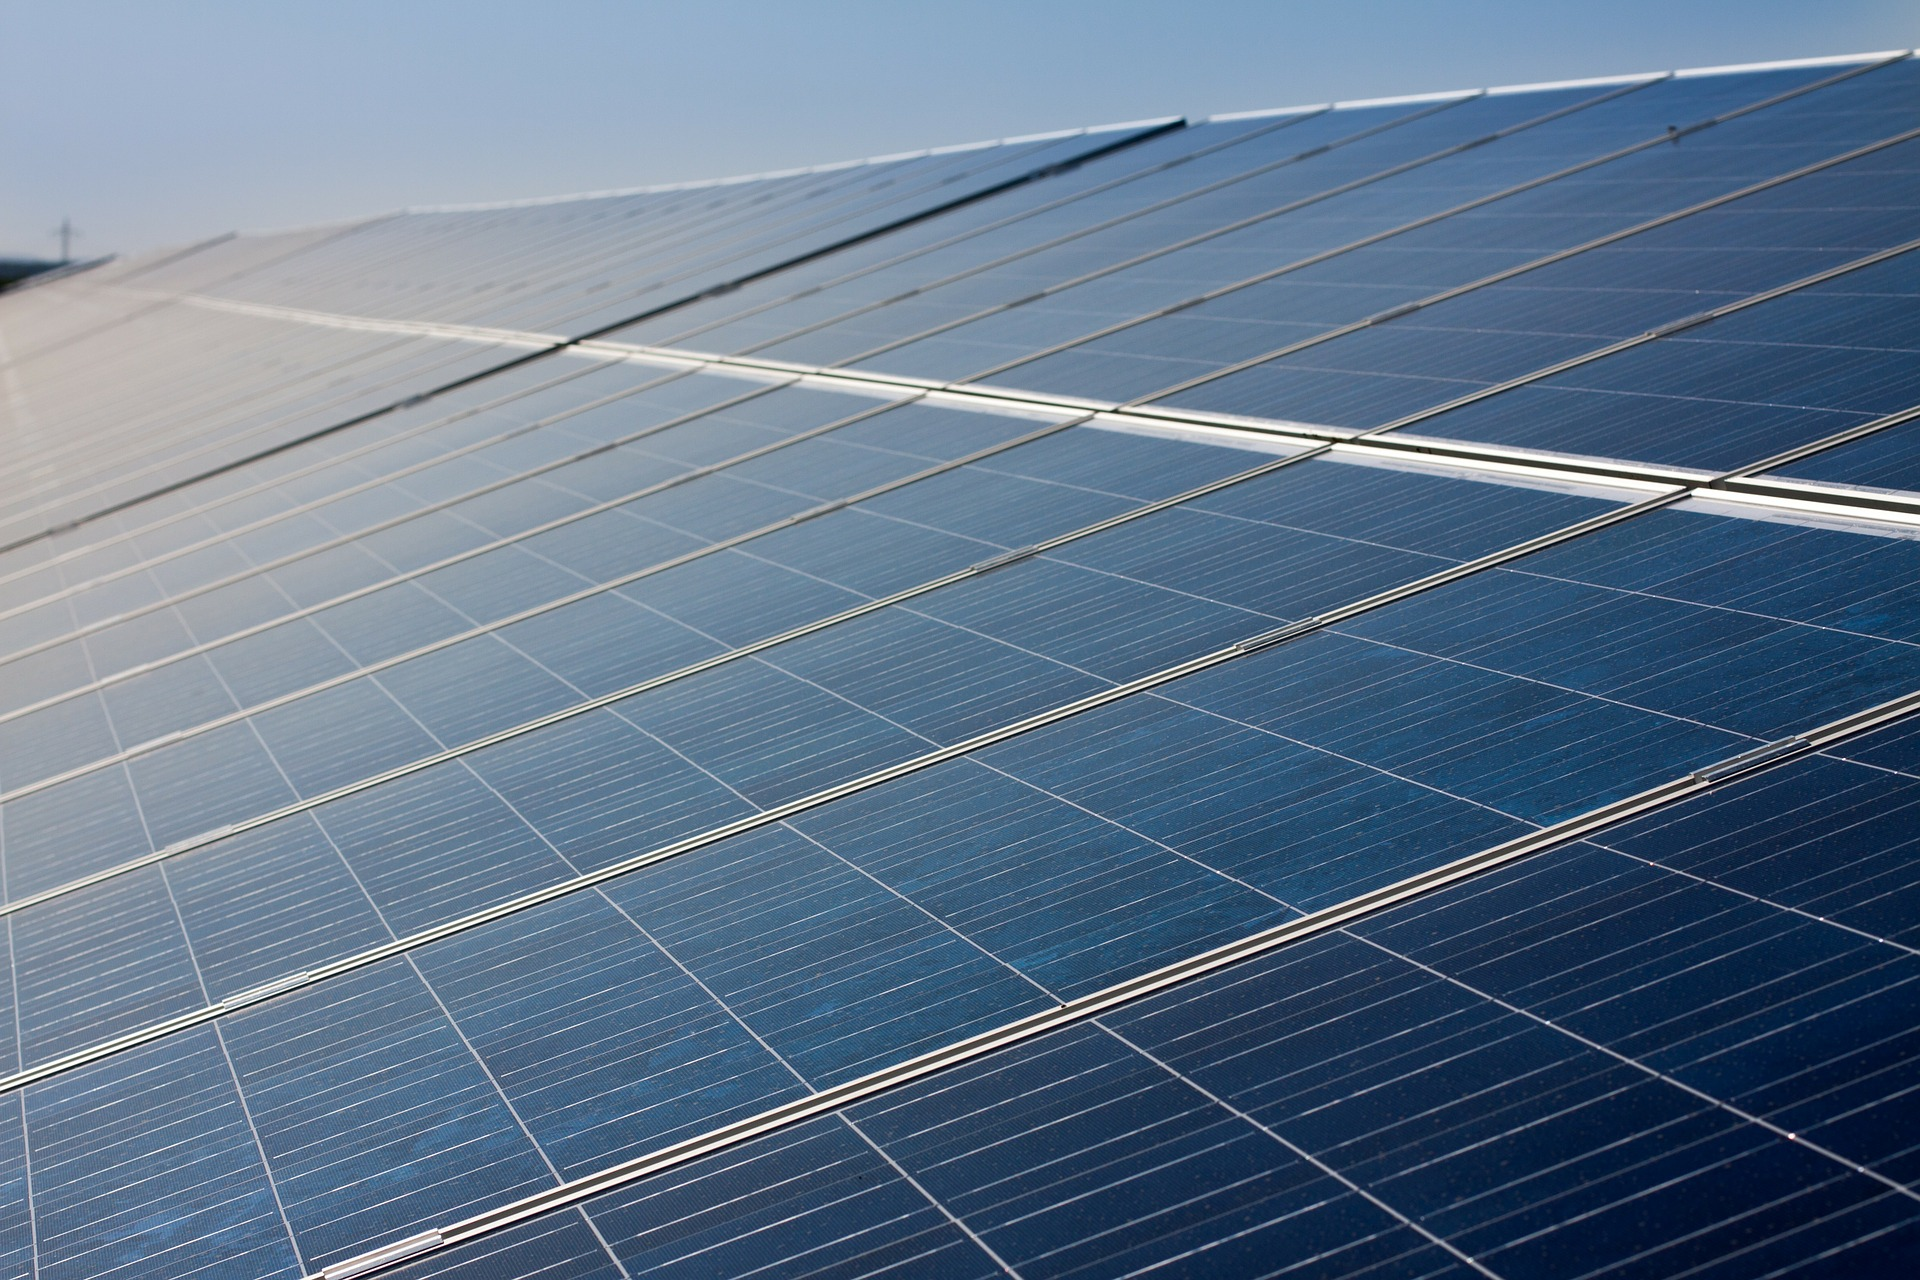 Mundo da energia solar - Elysia sistema fotovoltaico Rio Grande do Sul